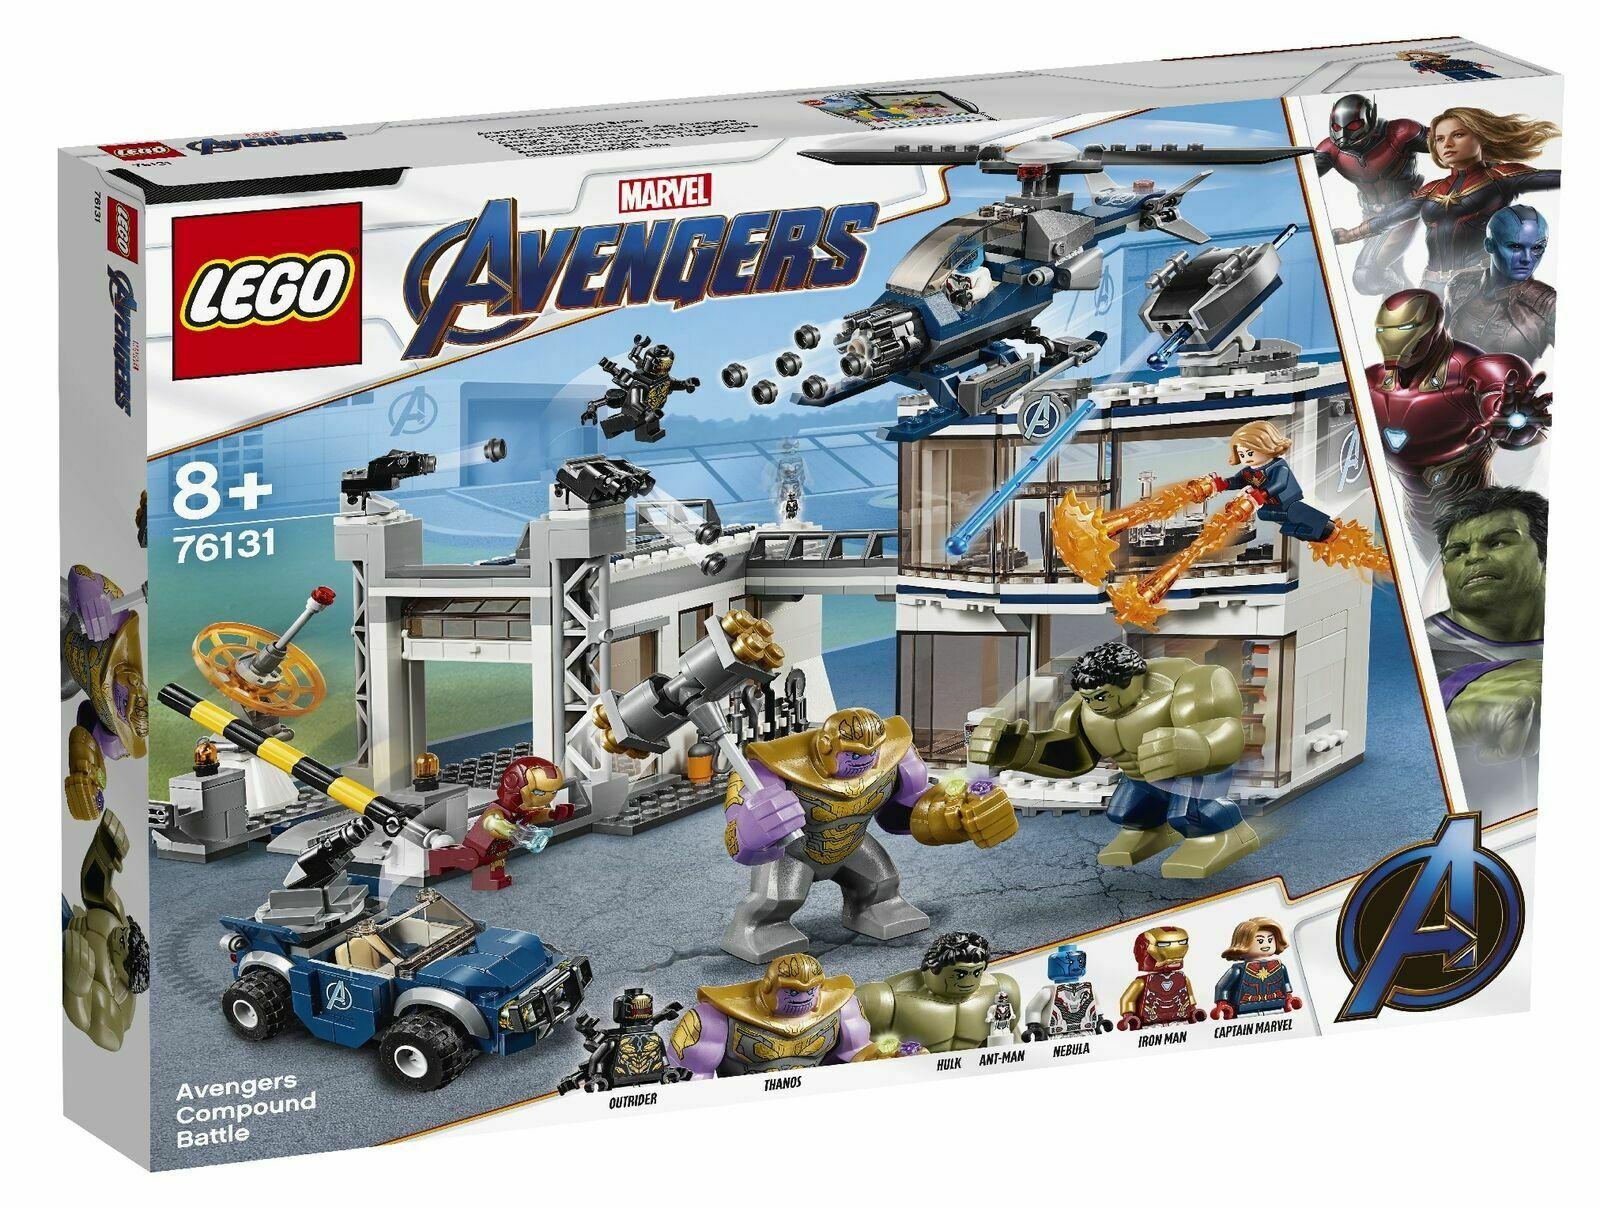 LEGO 76131 Avengers Compound Battle Superhero Playset - £58.50 instore @ Tesco Farnworth